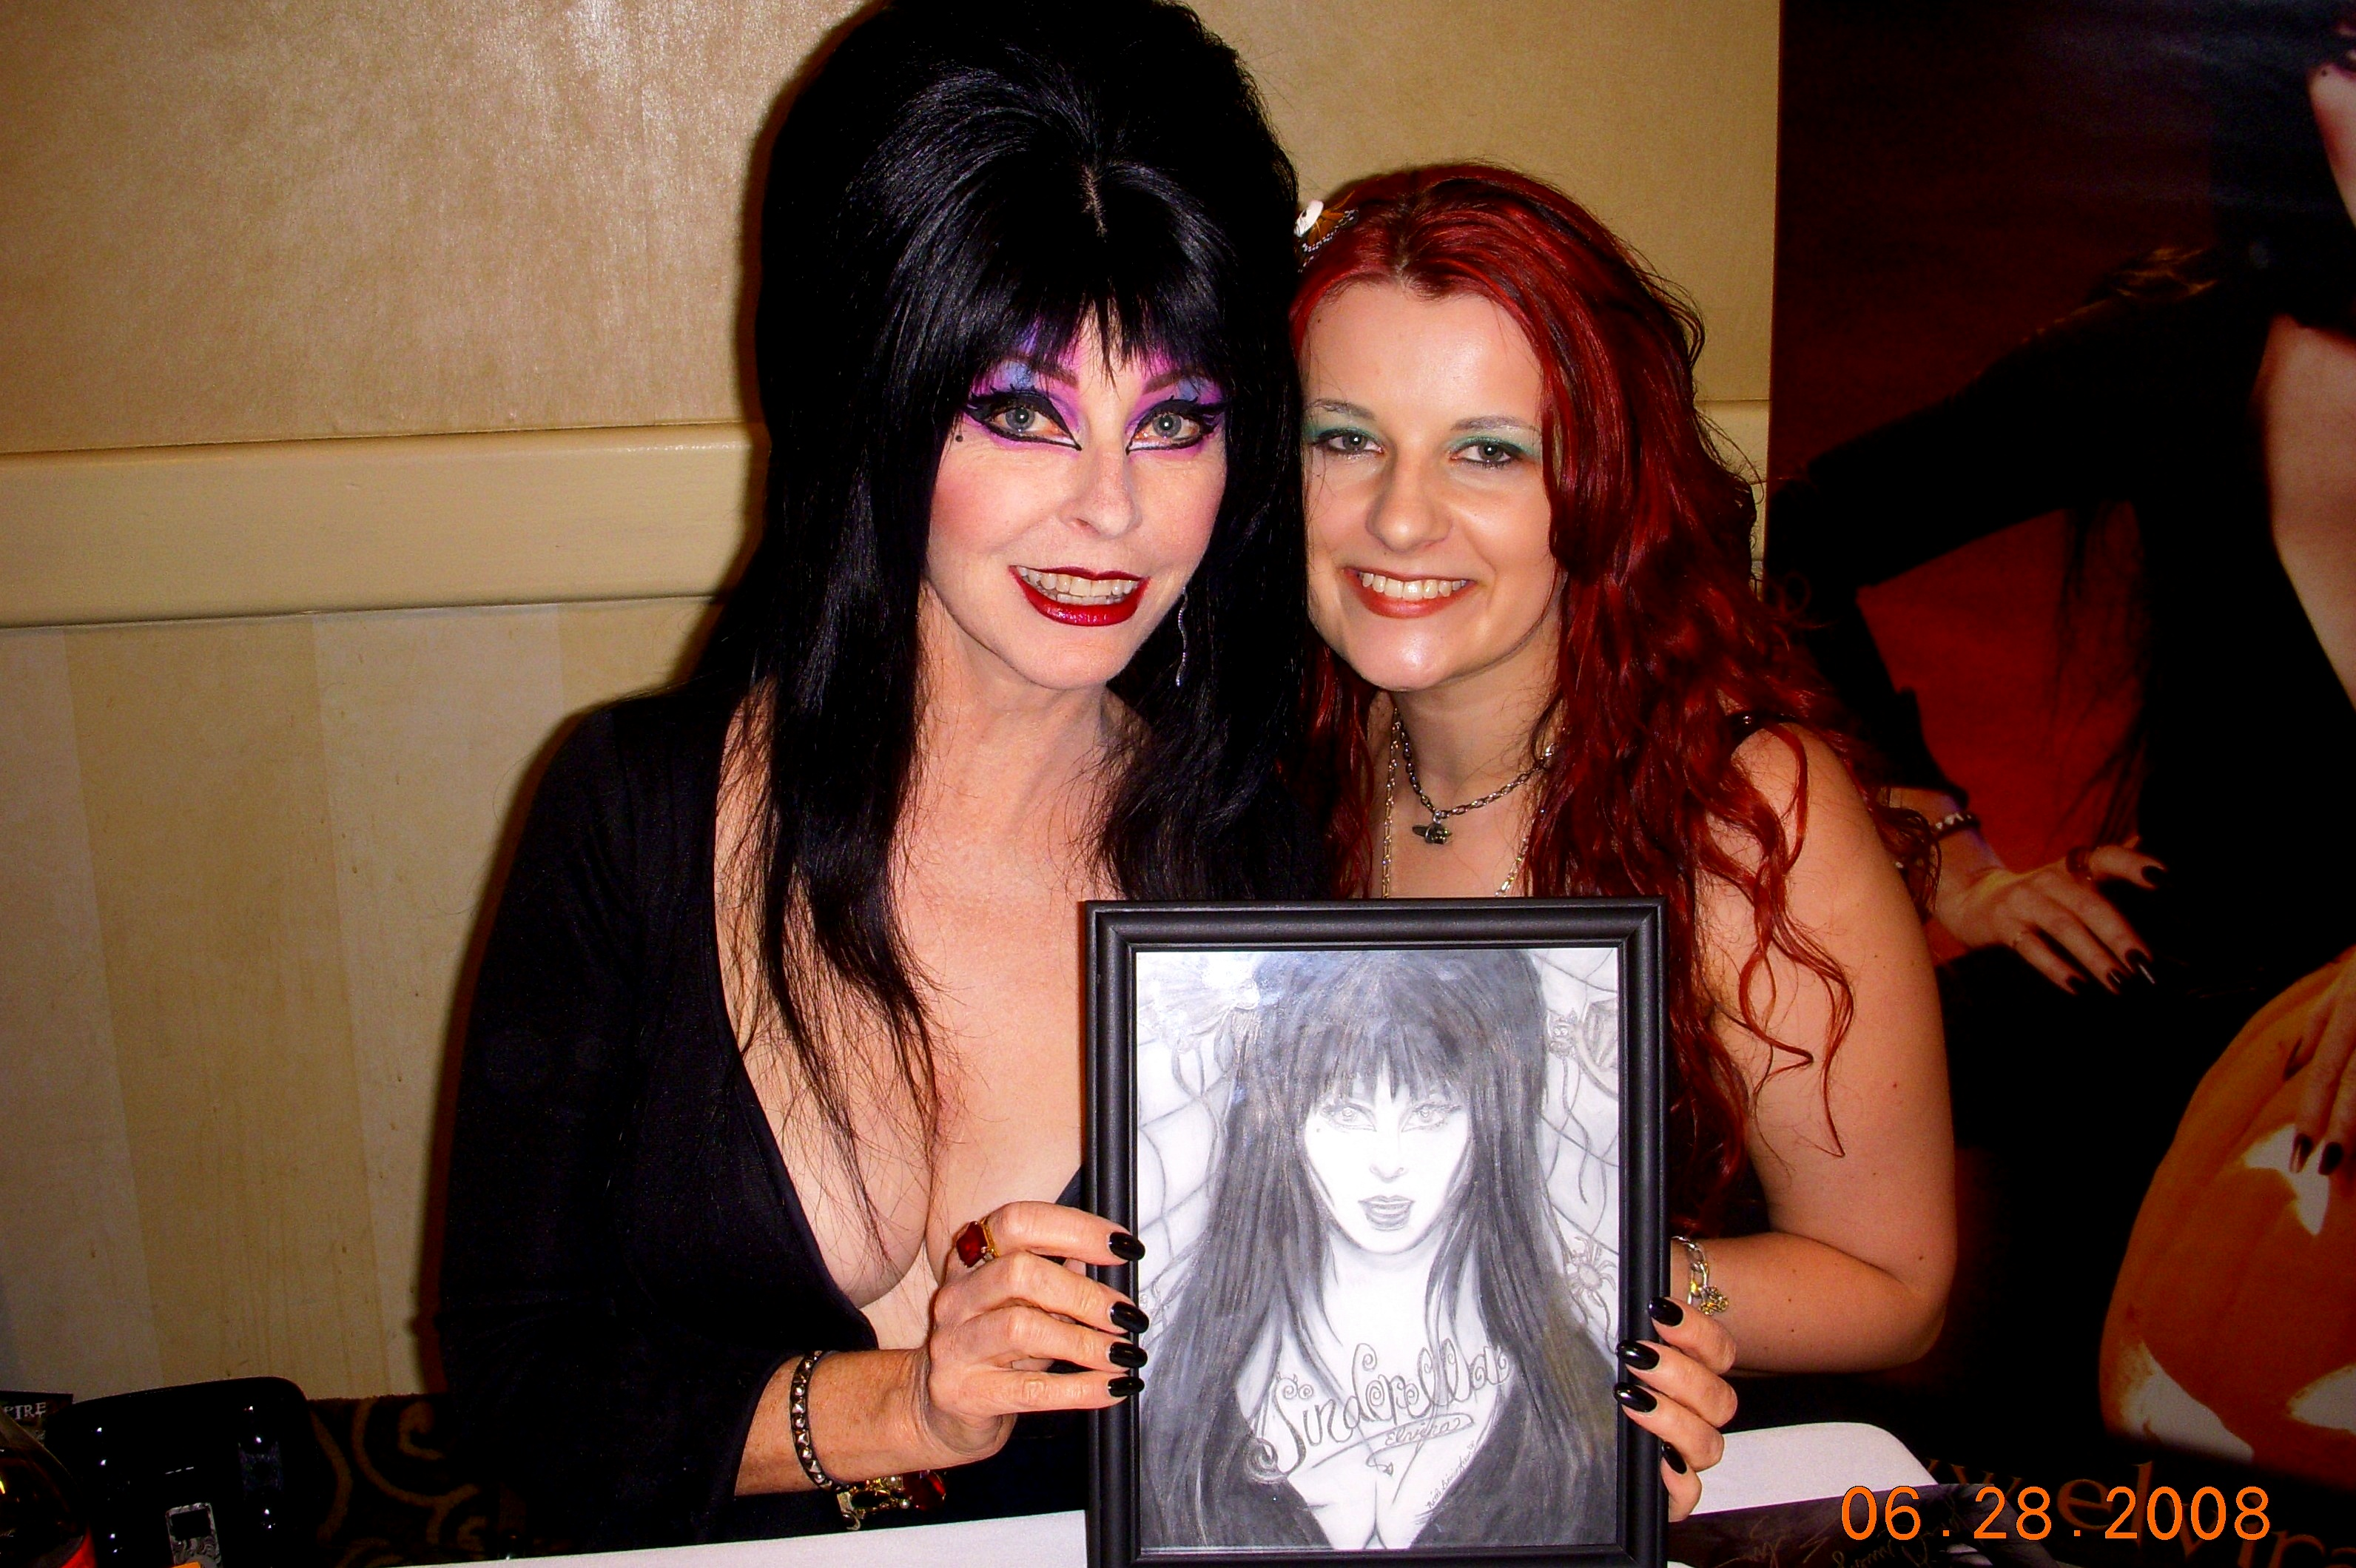 Gifting to Elvira